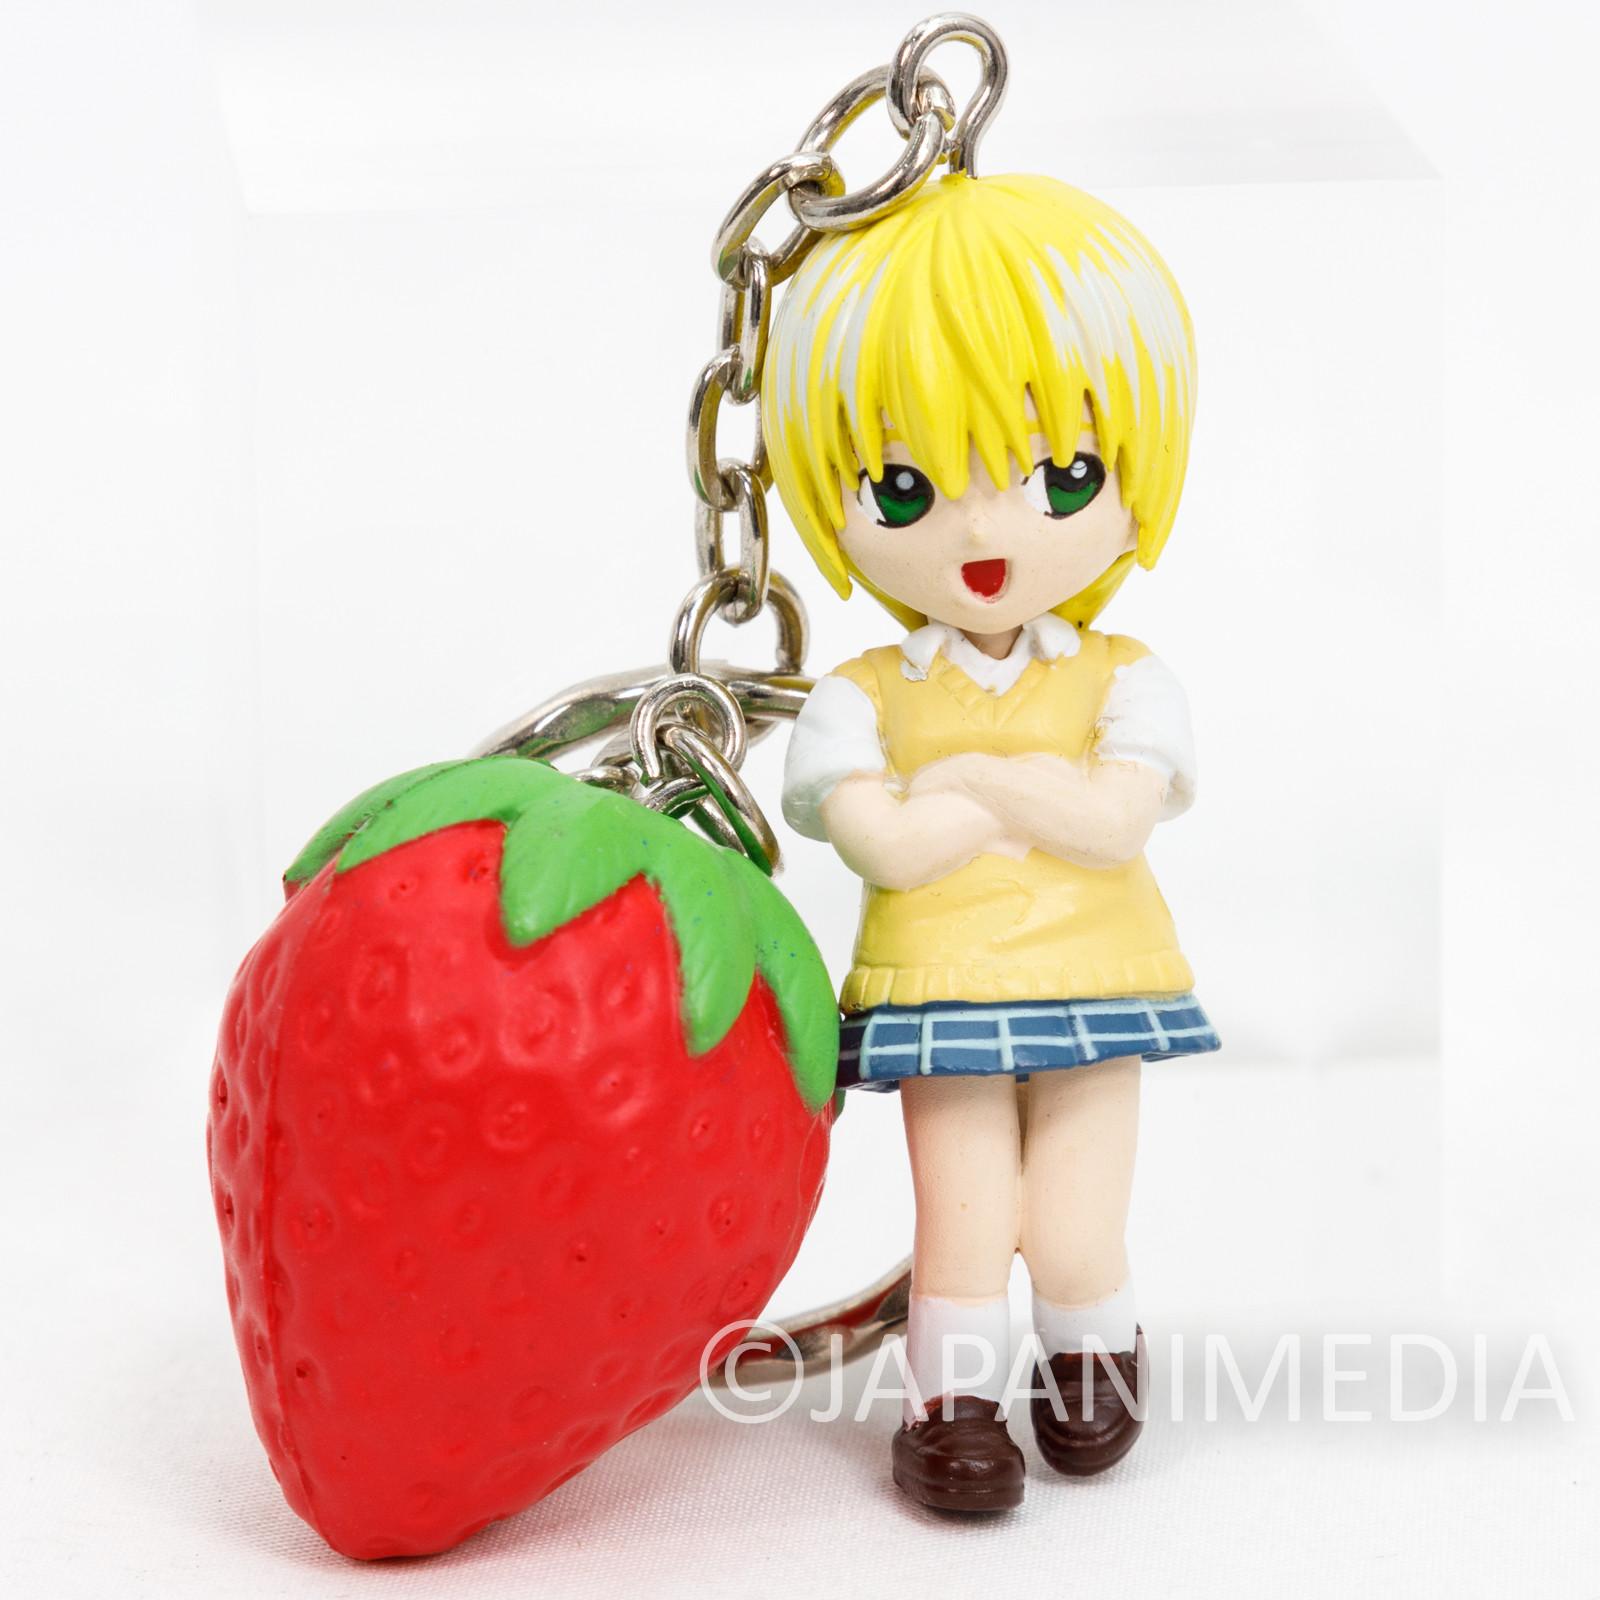 Strawberry Ichigo 100% Tsukasa Nishino Figure Keychain JAPAN ANIME MANGA